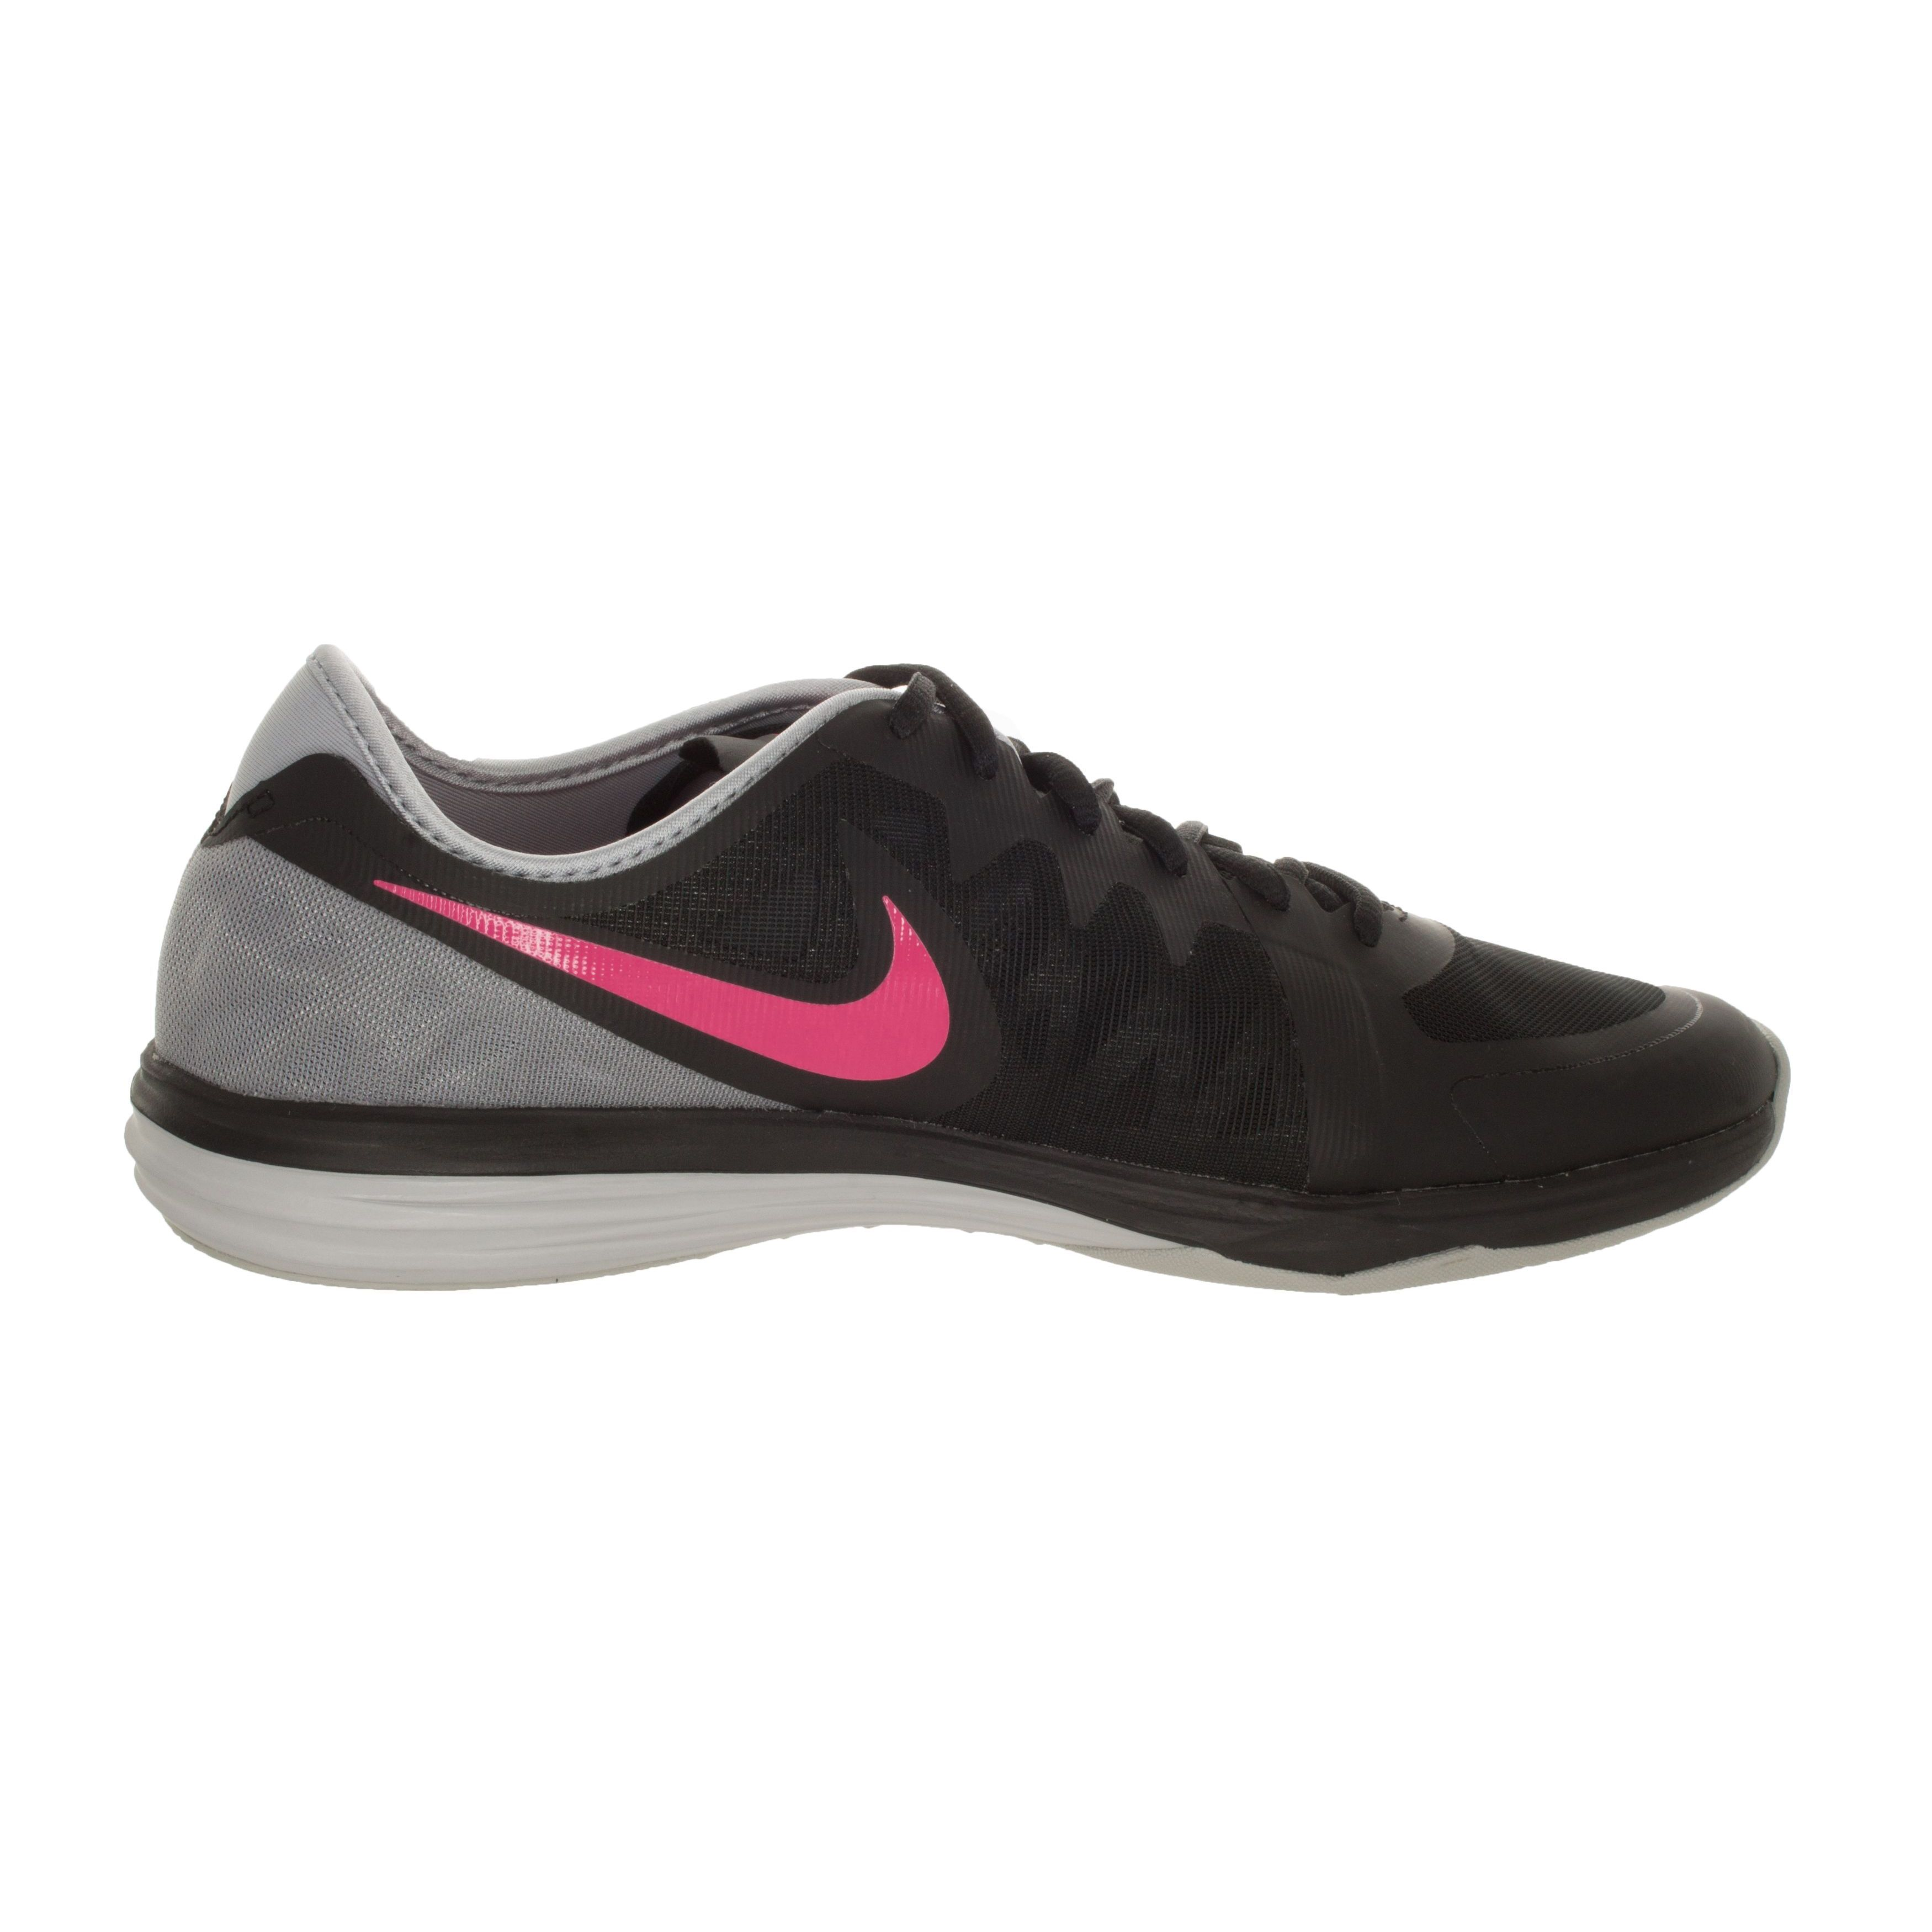 wholesale dealer ba8d1 0c64d Shop Nike Women s Dual Fusion Tr 3 Black Pink Pow Wolf Grey Training Shoe -  Free Shipping Today - Overstock - 12362350